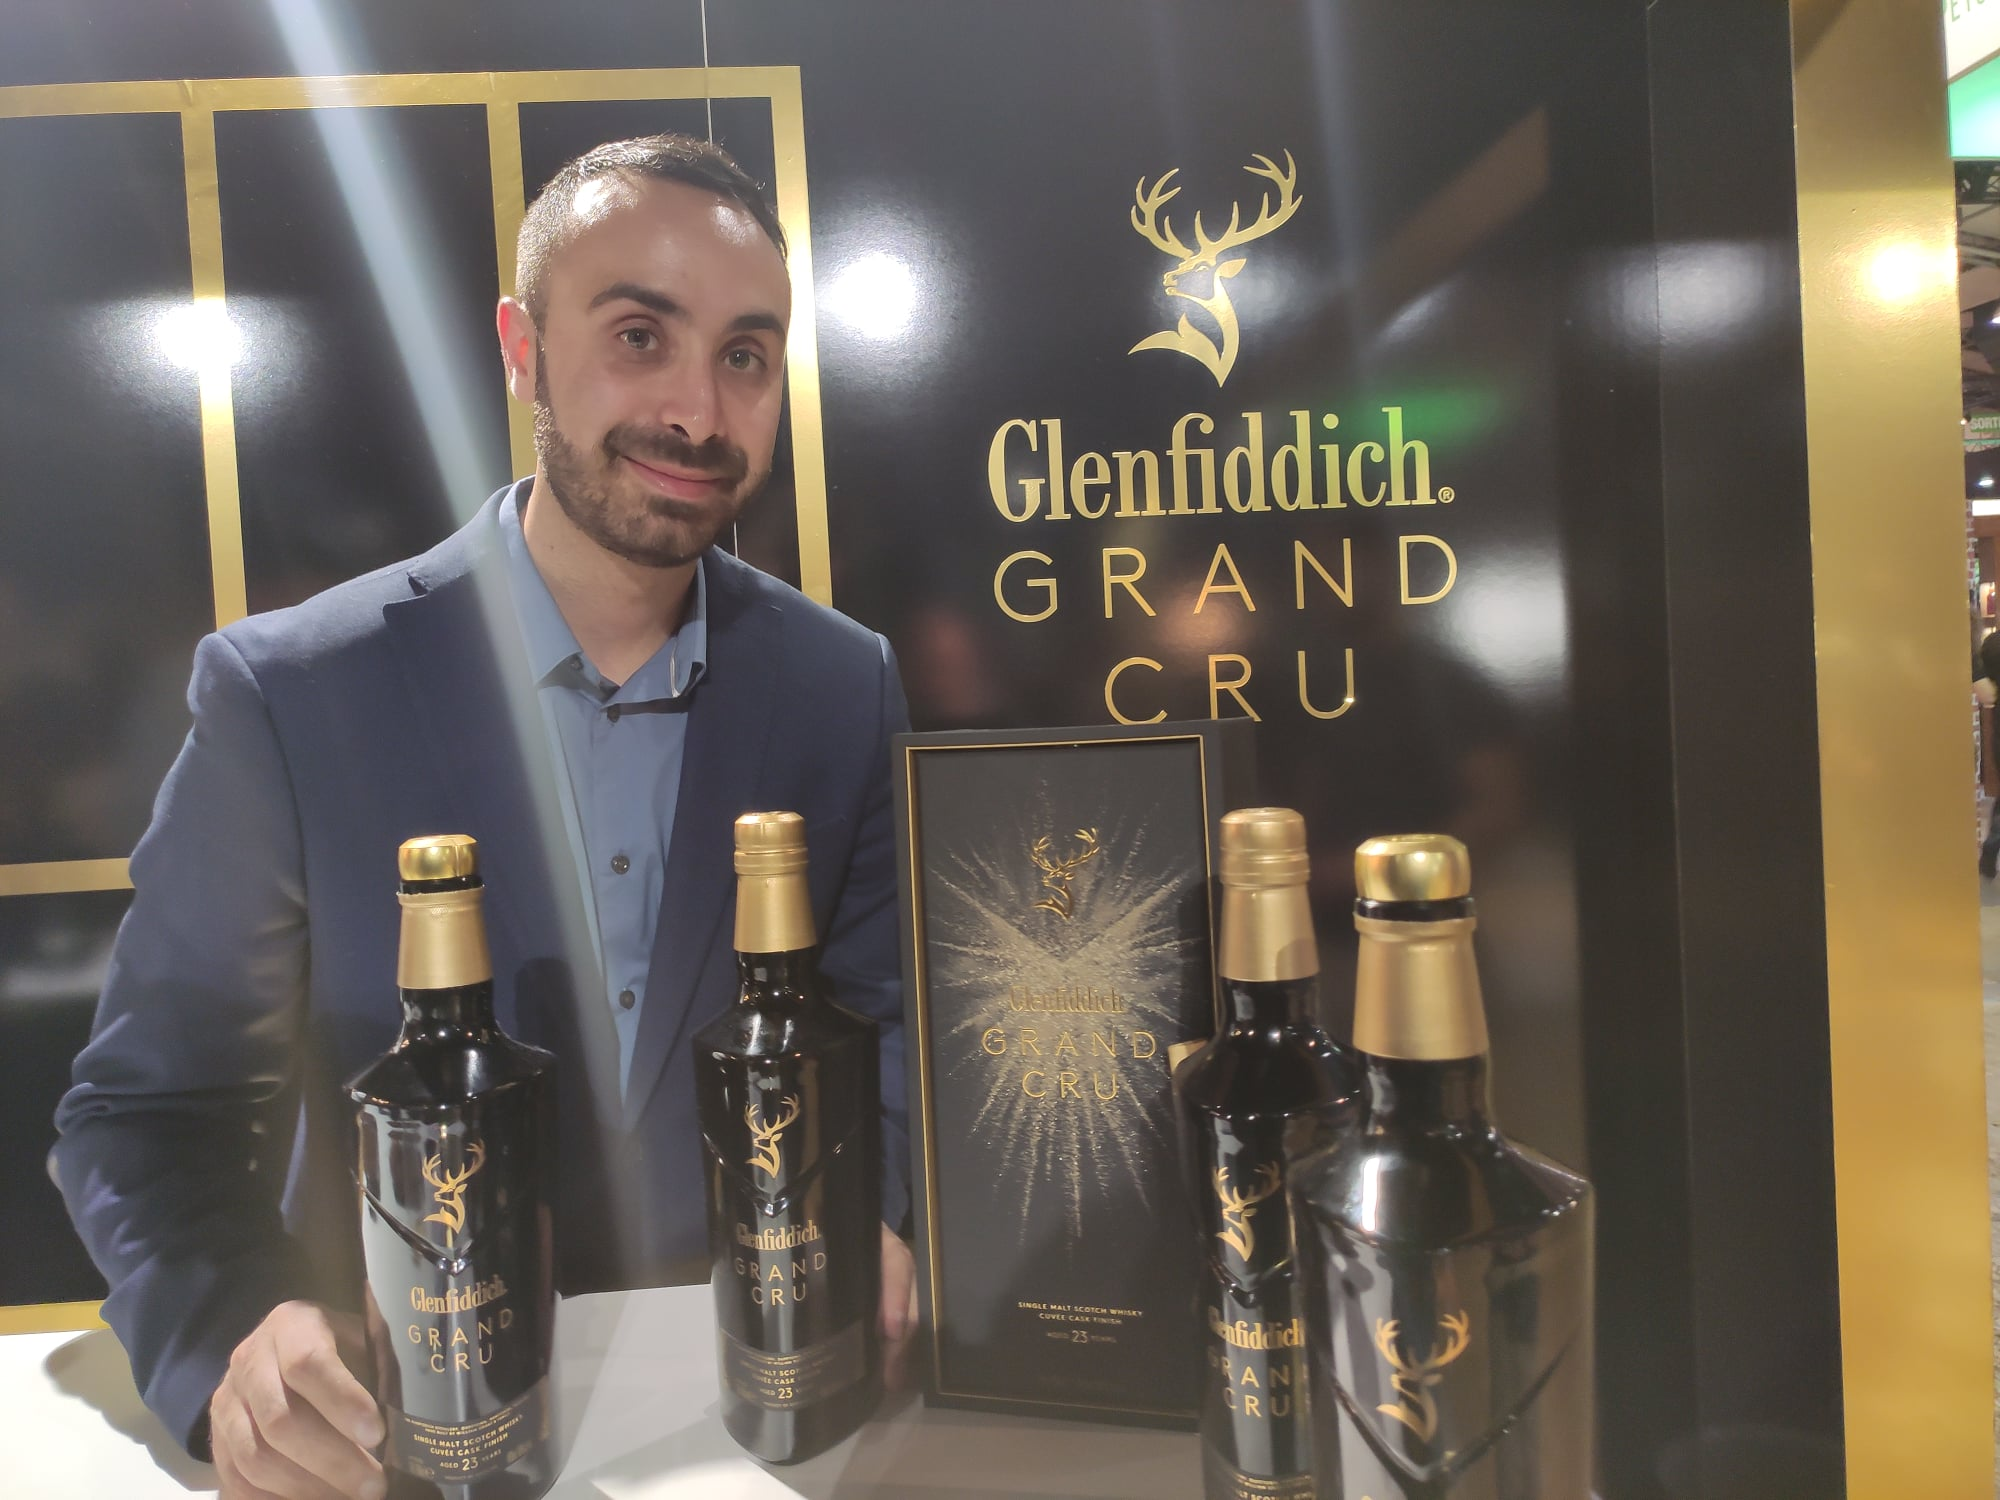 Jerome Kaftandjian - Brand ambassador Glenfiddich